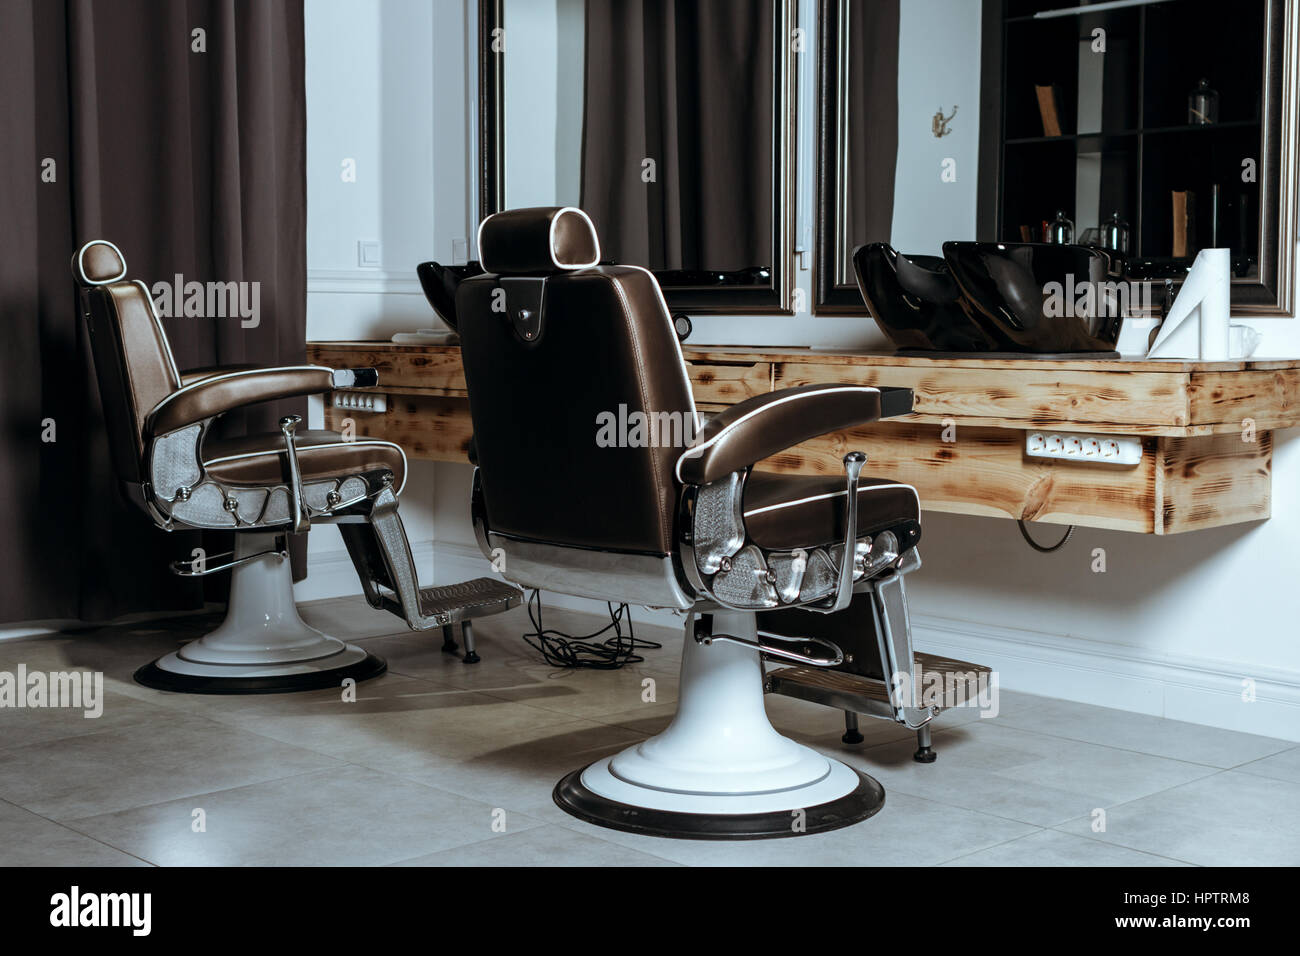 Vintage barber shop chairs - Stock Photo Stylish Vintage Barber Chairs In Wooden Interior Barbershop Theme